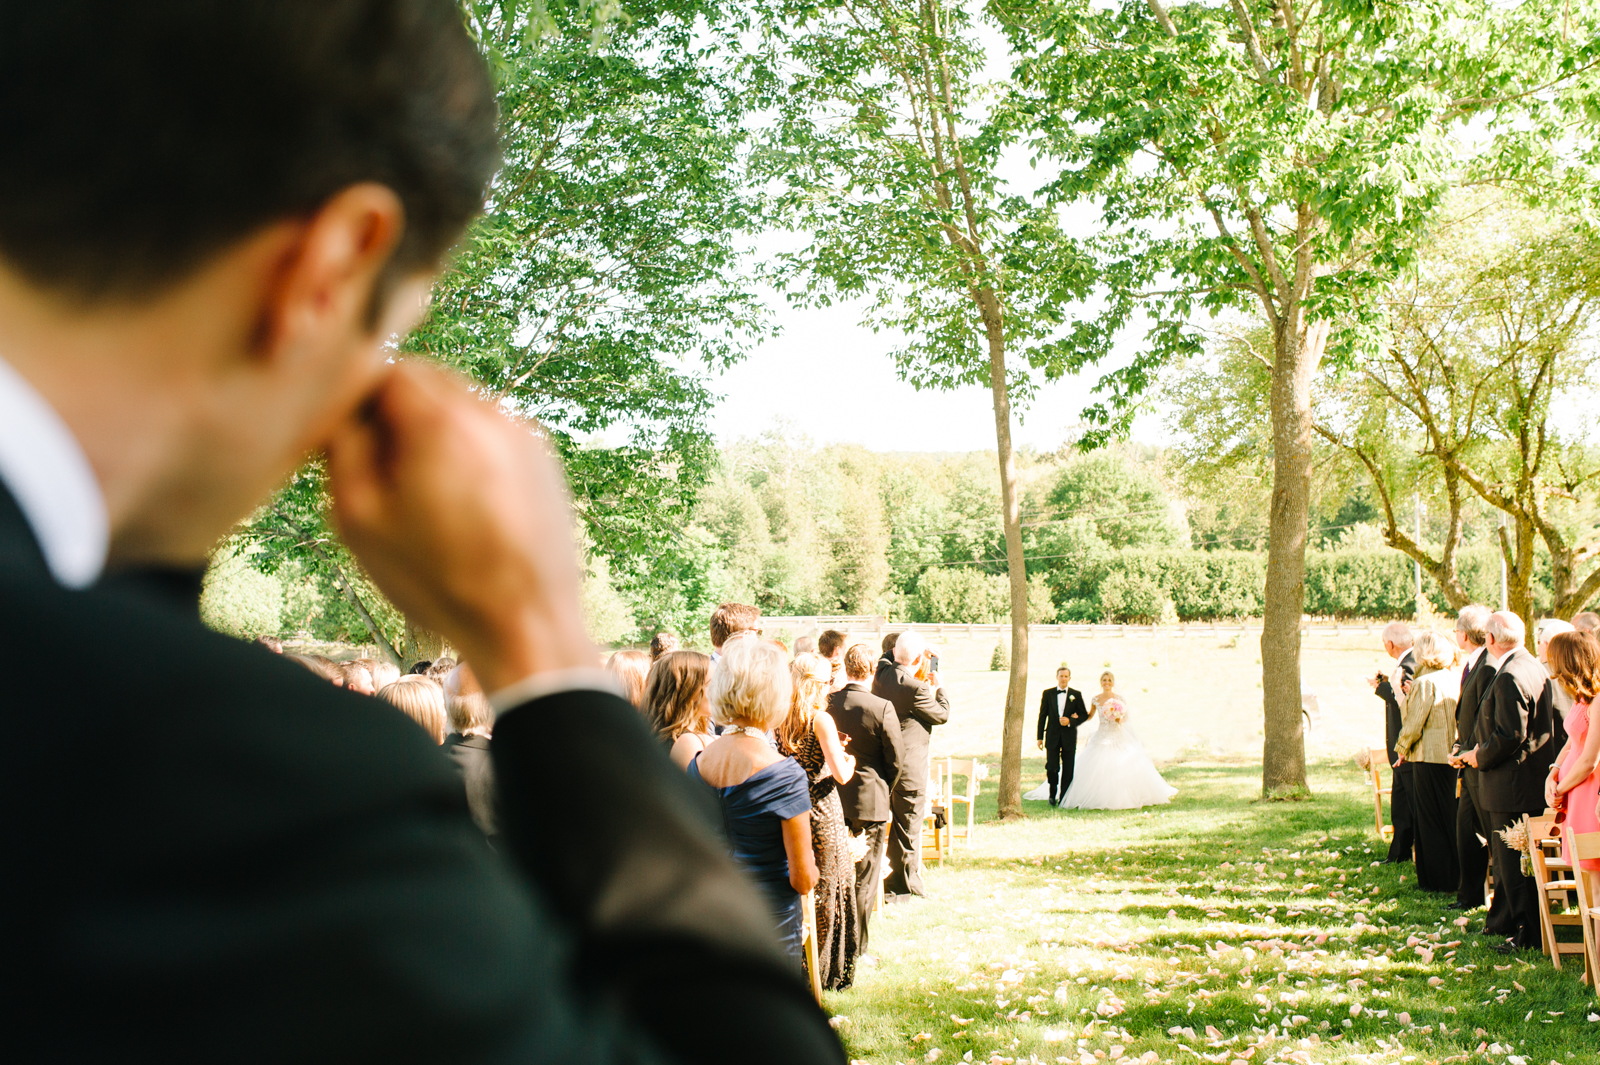 tara mcmullen photography toronto wedding photographer private estate wedding toronto cynthia martyn events toronto westway tents zuhair murad gown at-home wedding toronto-015